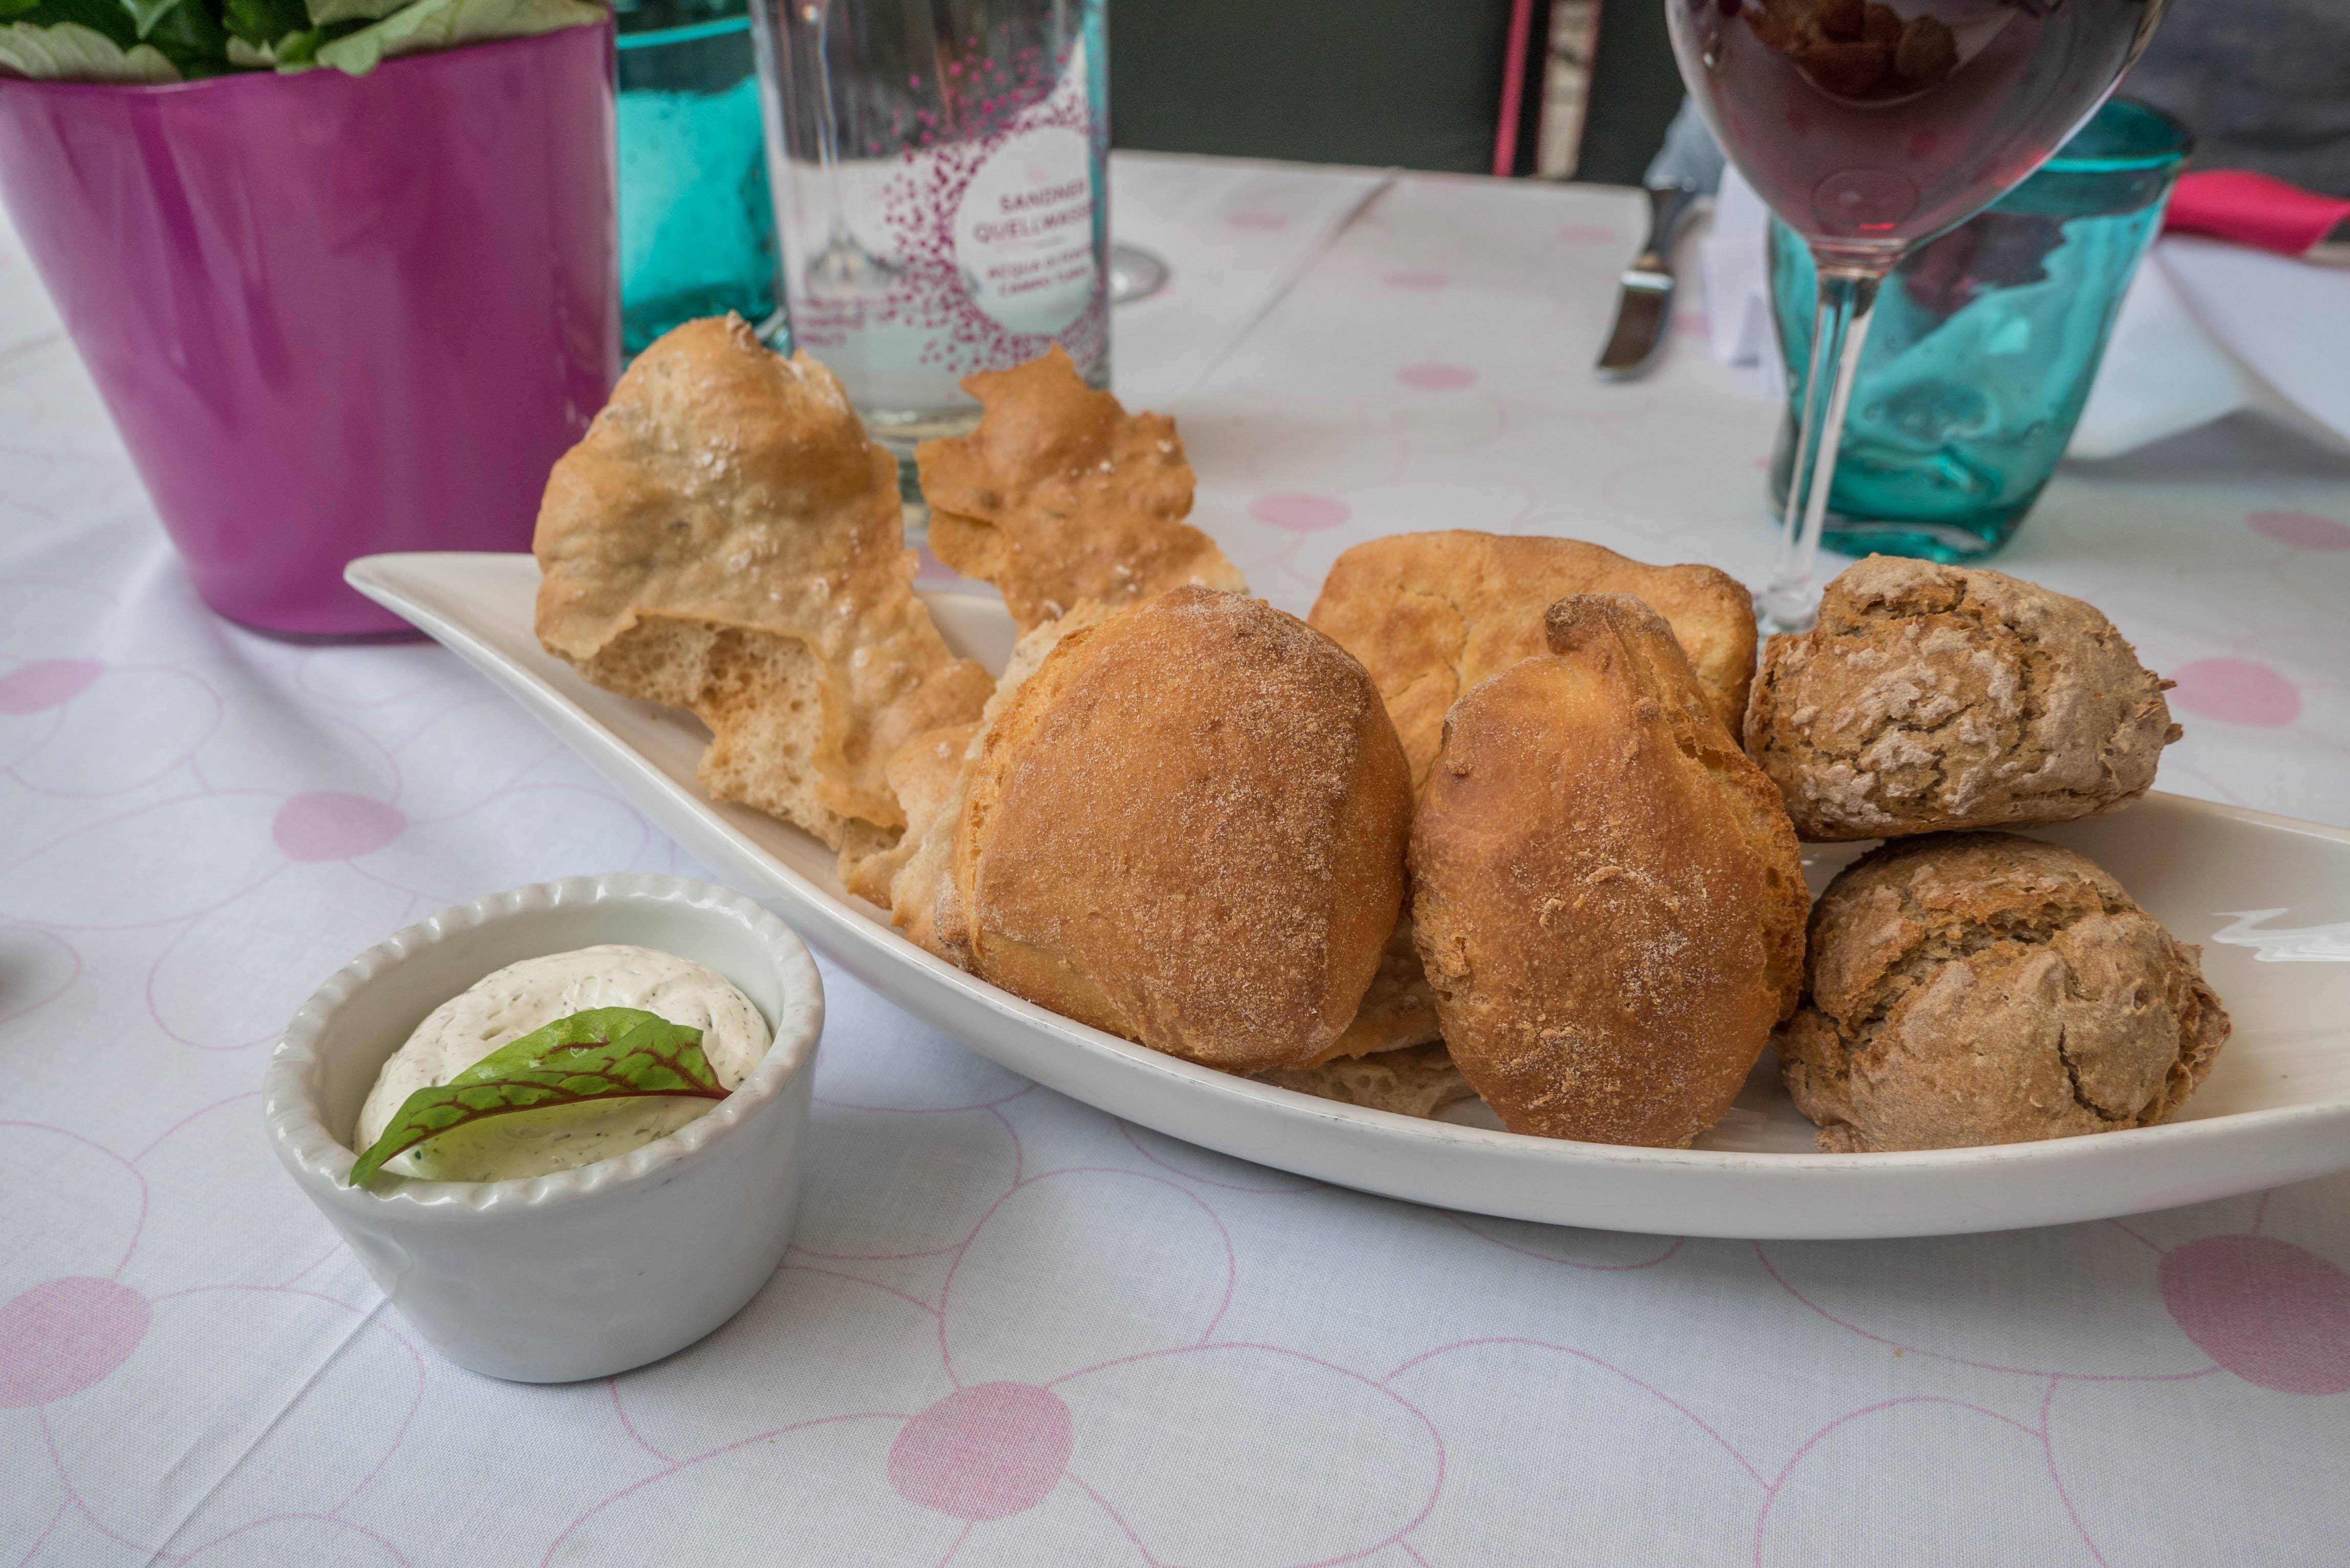 A Tasty Hike - Drumlerhof Suedtirol Sand in Taufers - Glutenfreies Brot